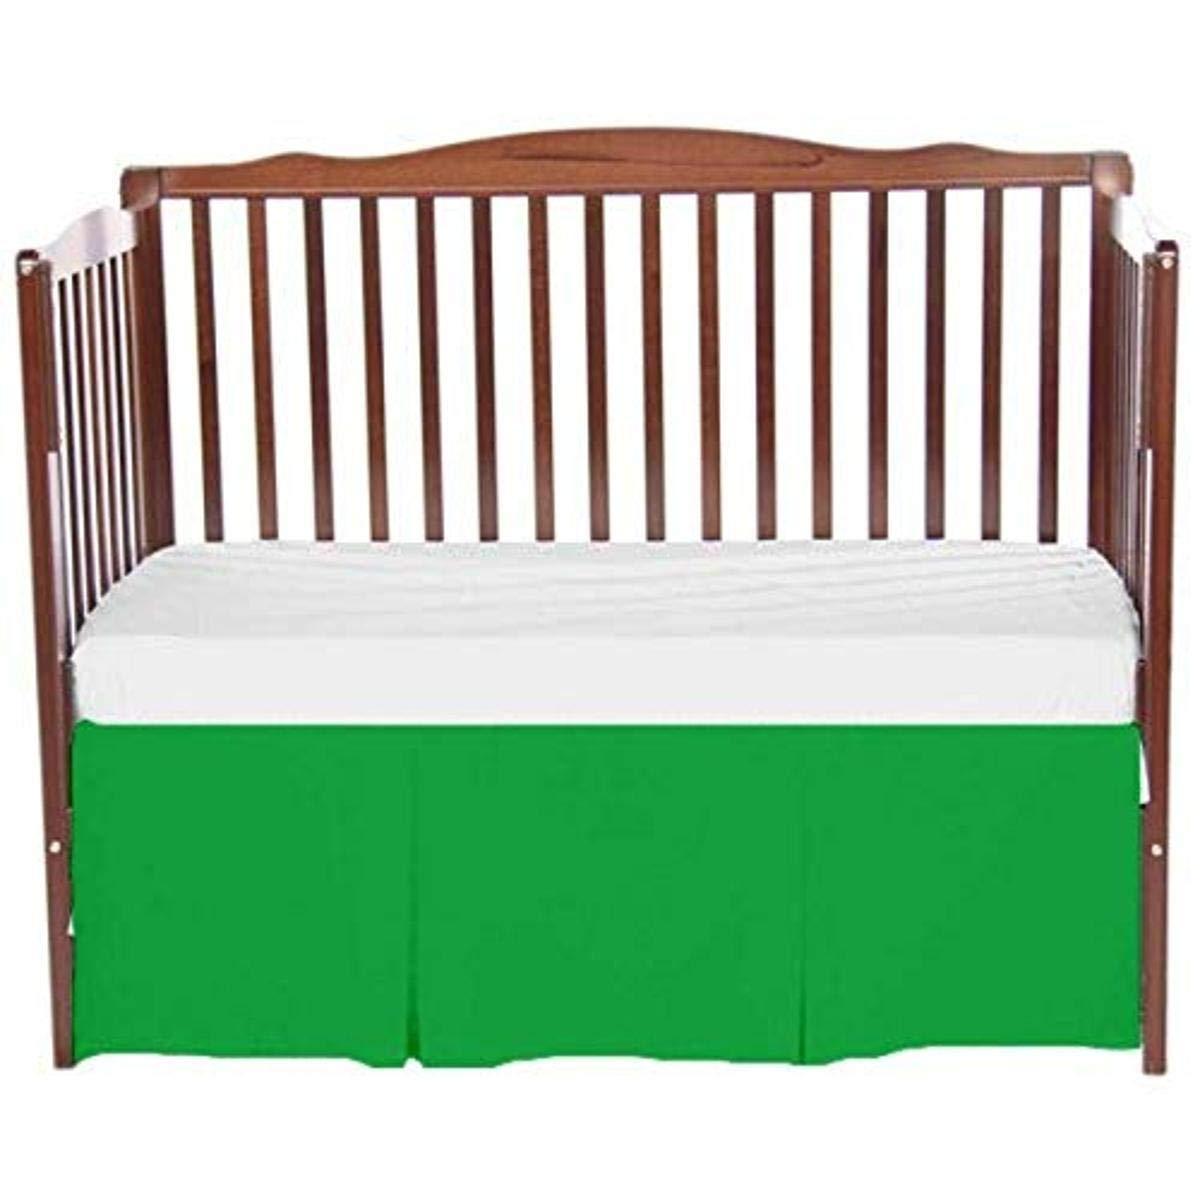 bkb Solid Tailored Mini Skirt Crib 時間指定不可 売店 Green